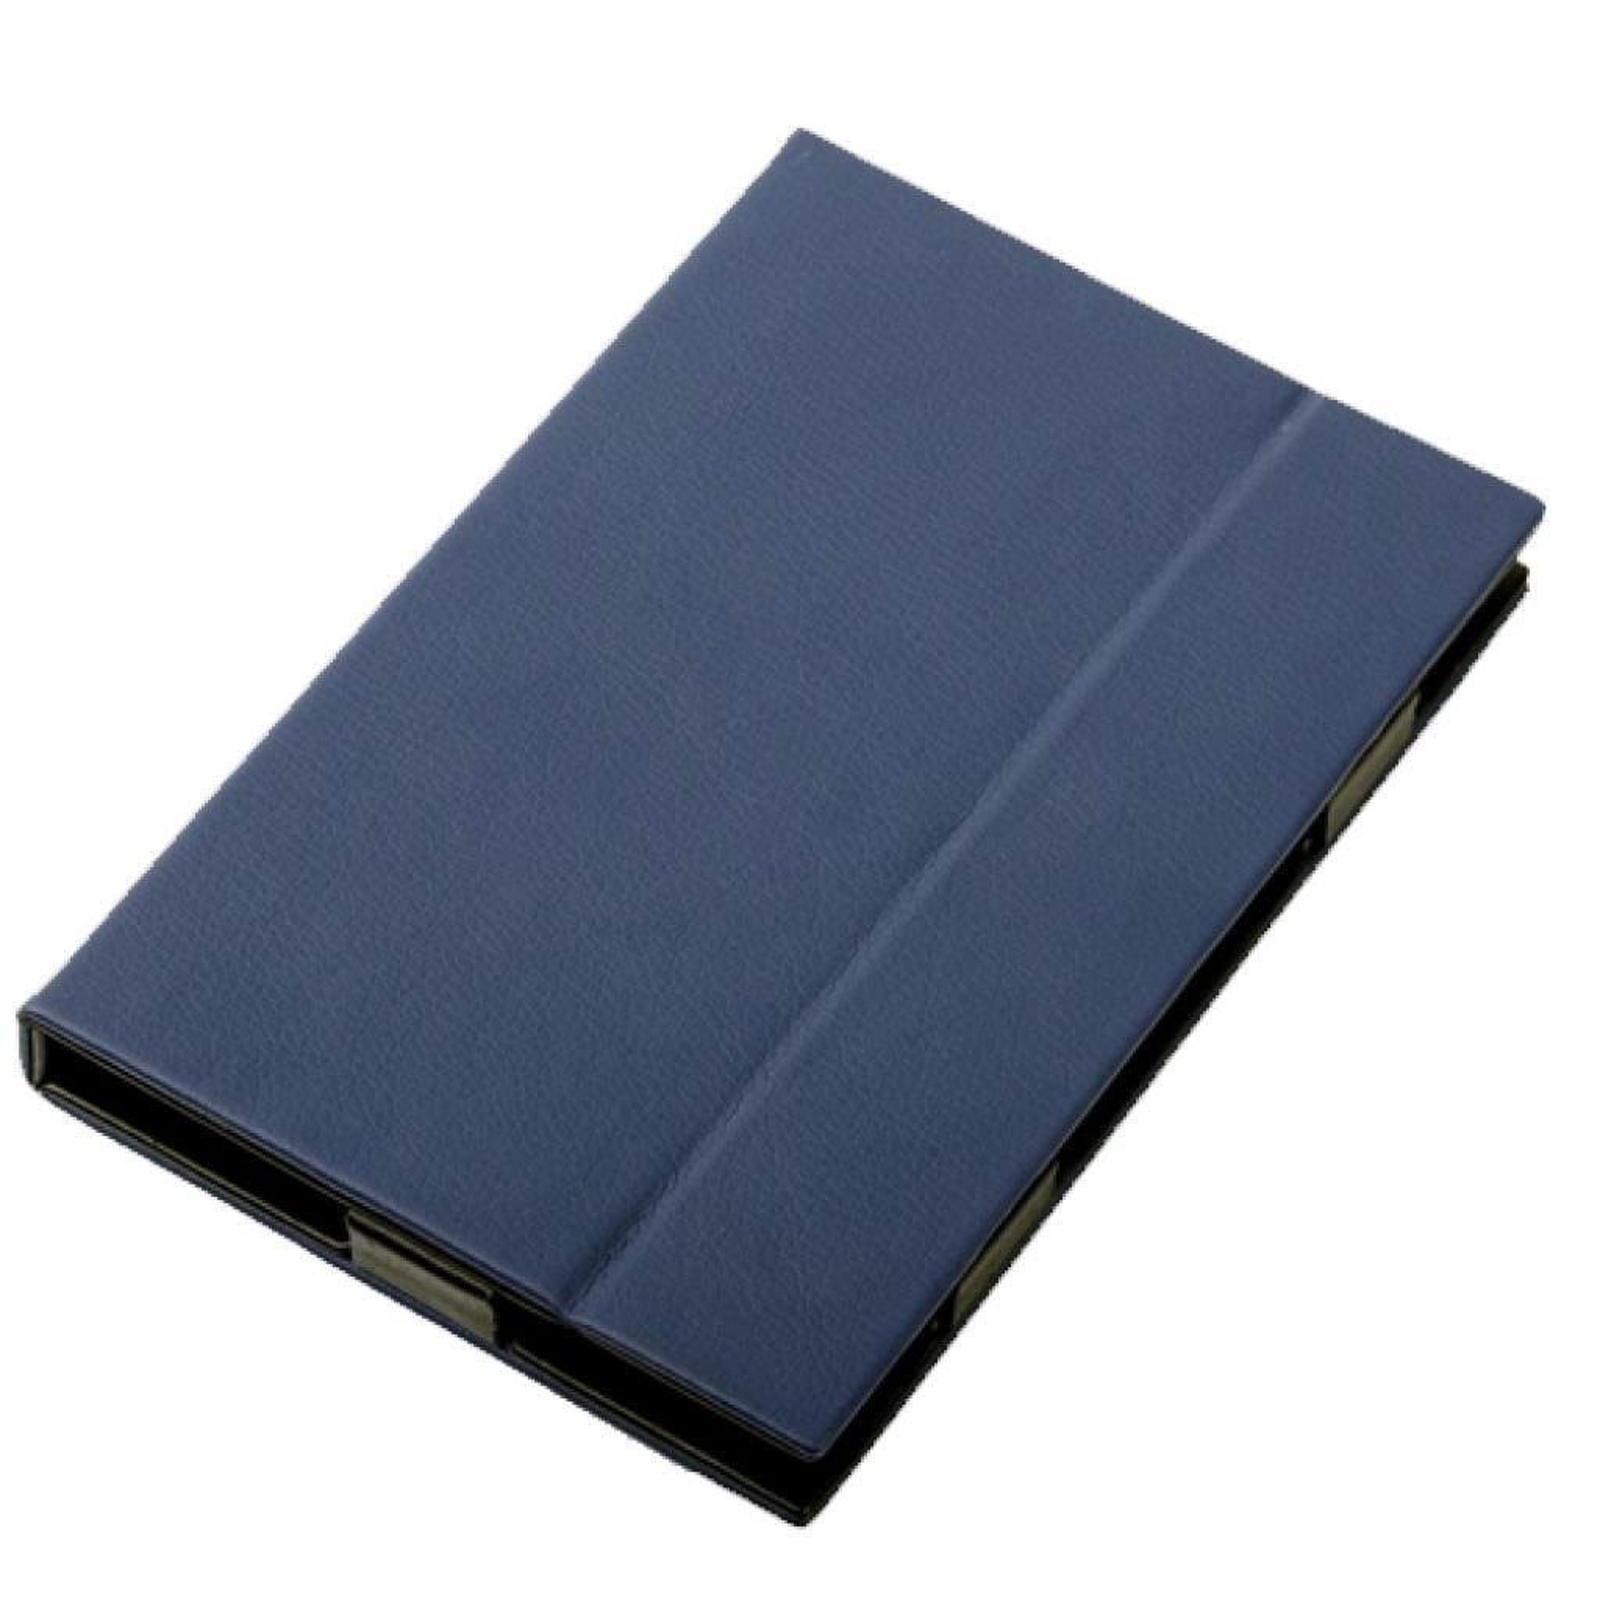 Чехол для планшета Vento 9 Desire Matt - dark blue